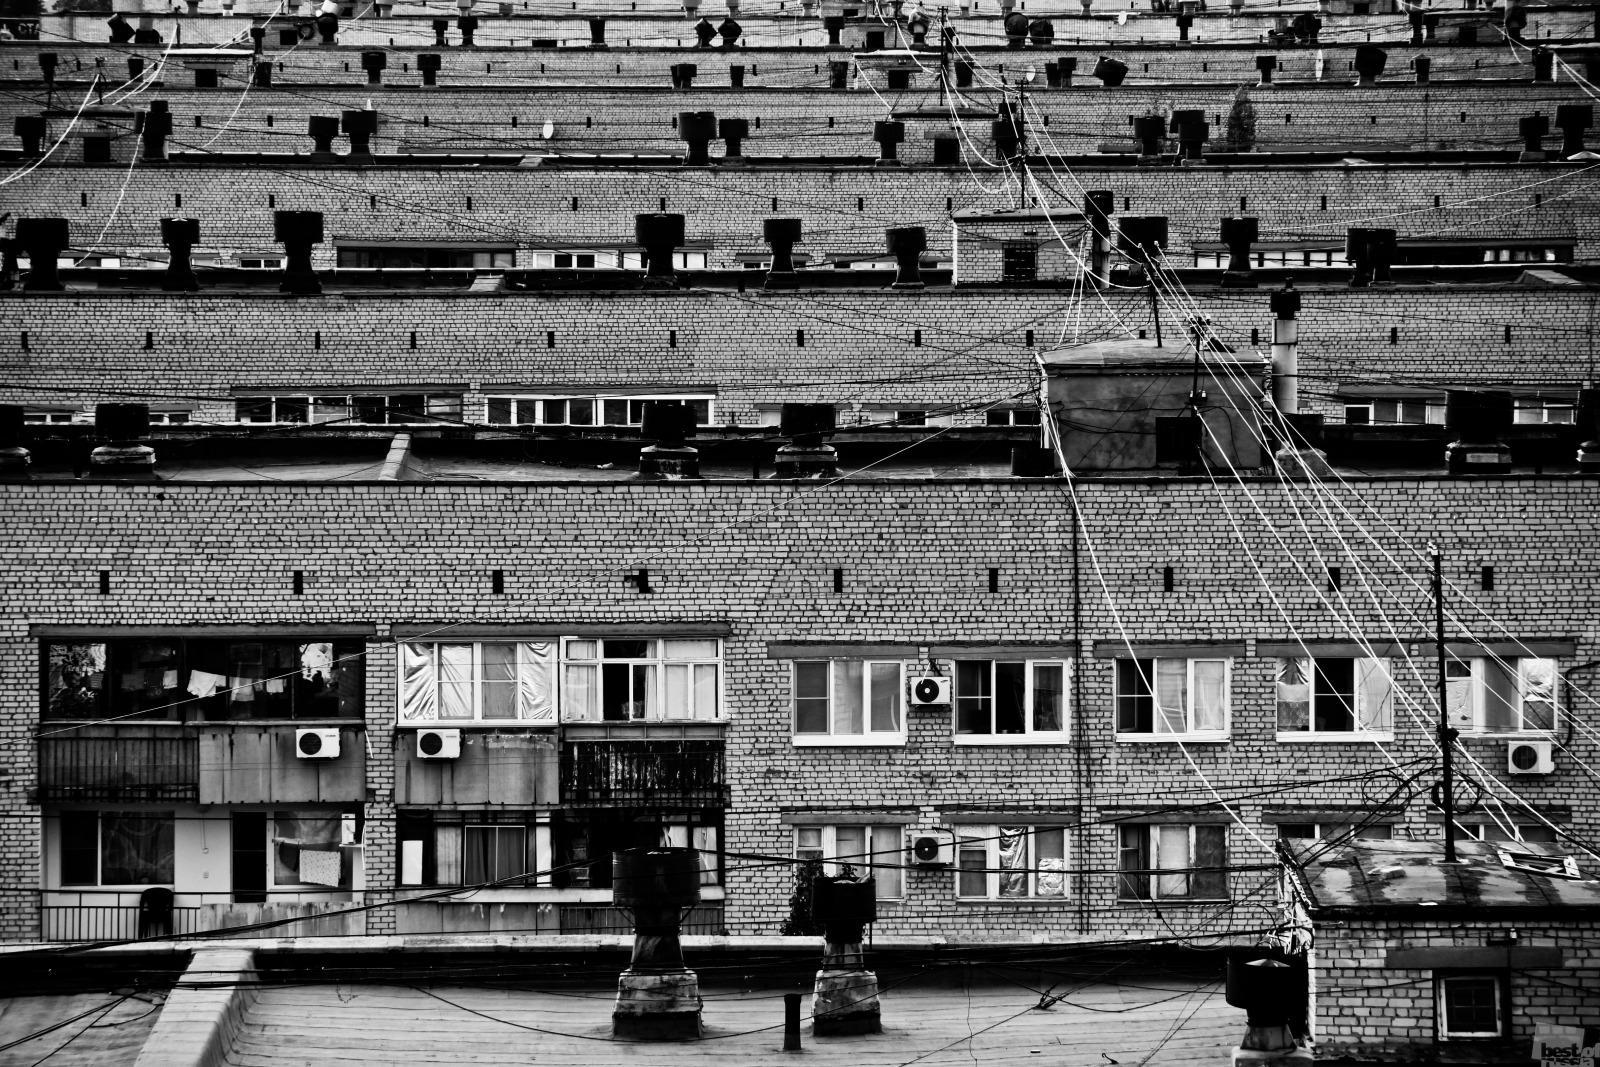 But most people still live in identical concrete boxes // The Volgograd Ghetto